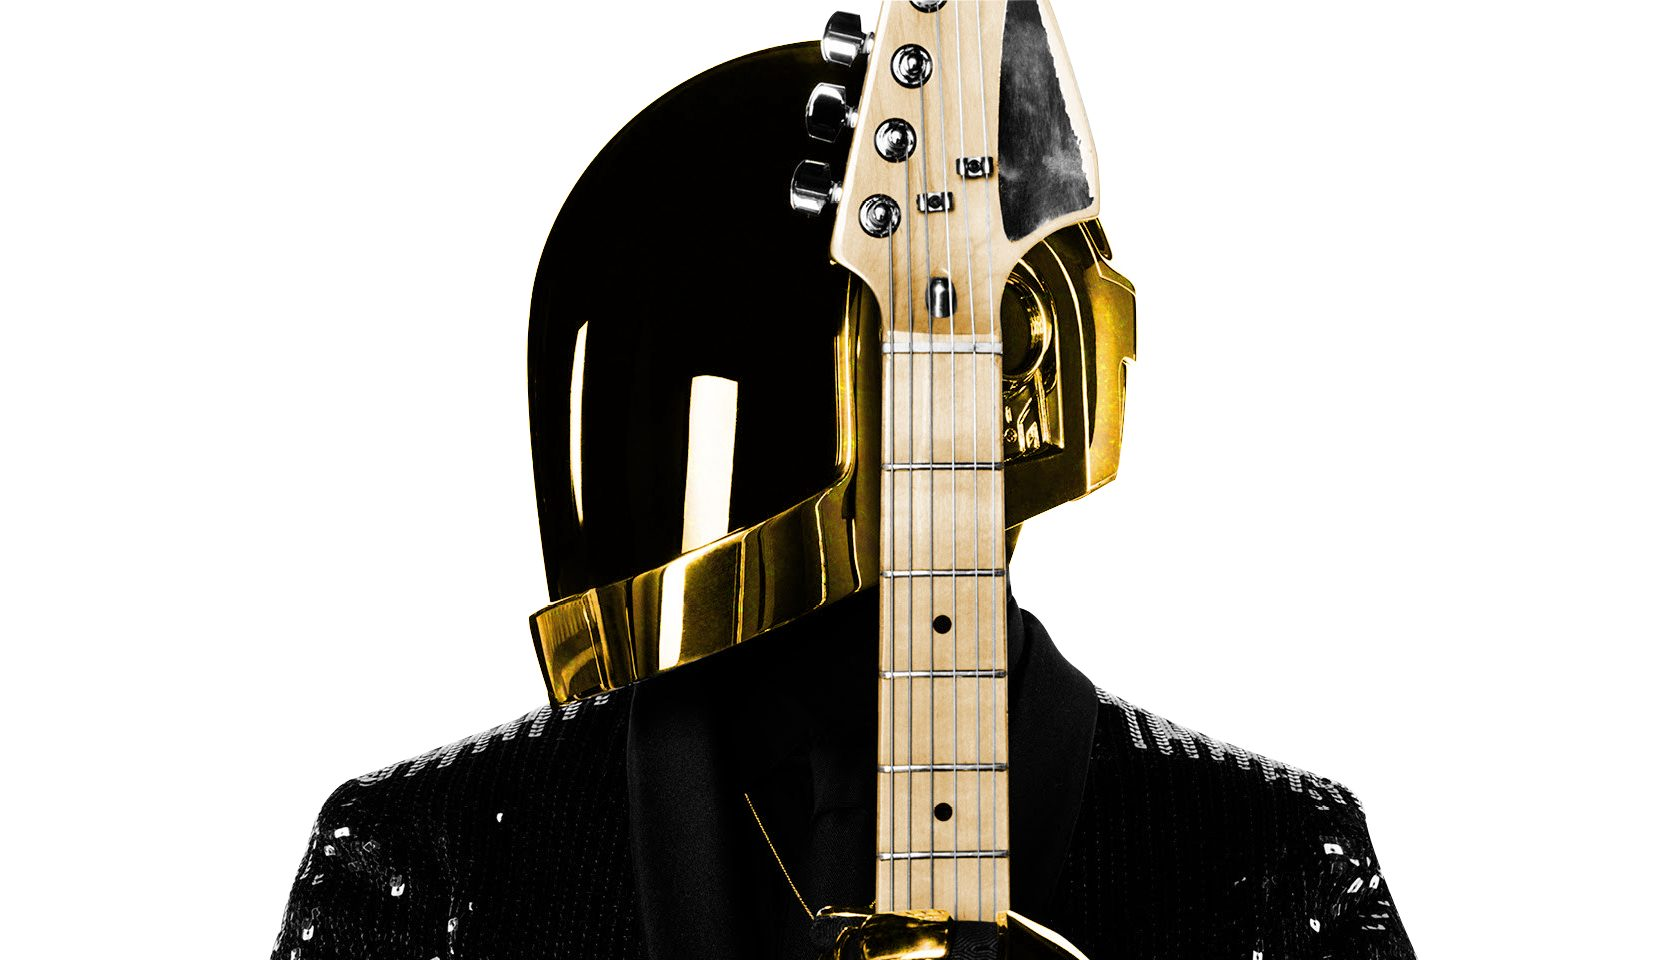 Daft Punk a Milano sui Navigli